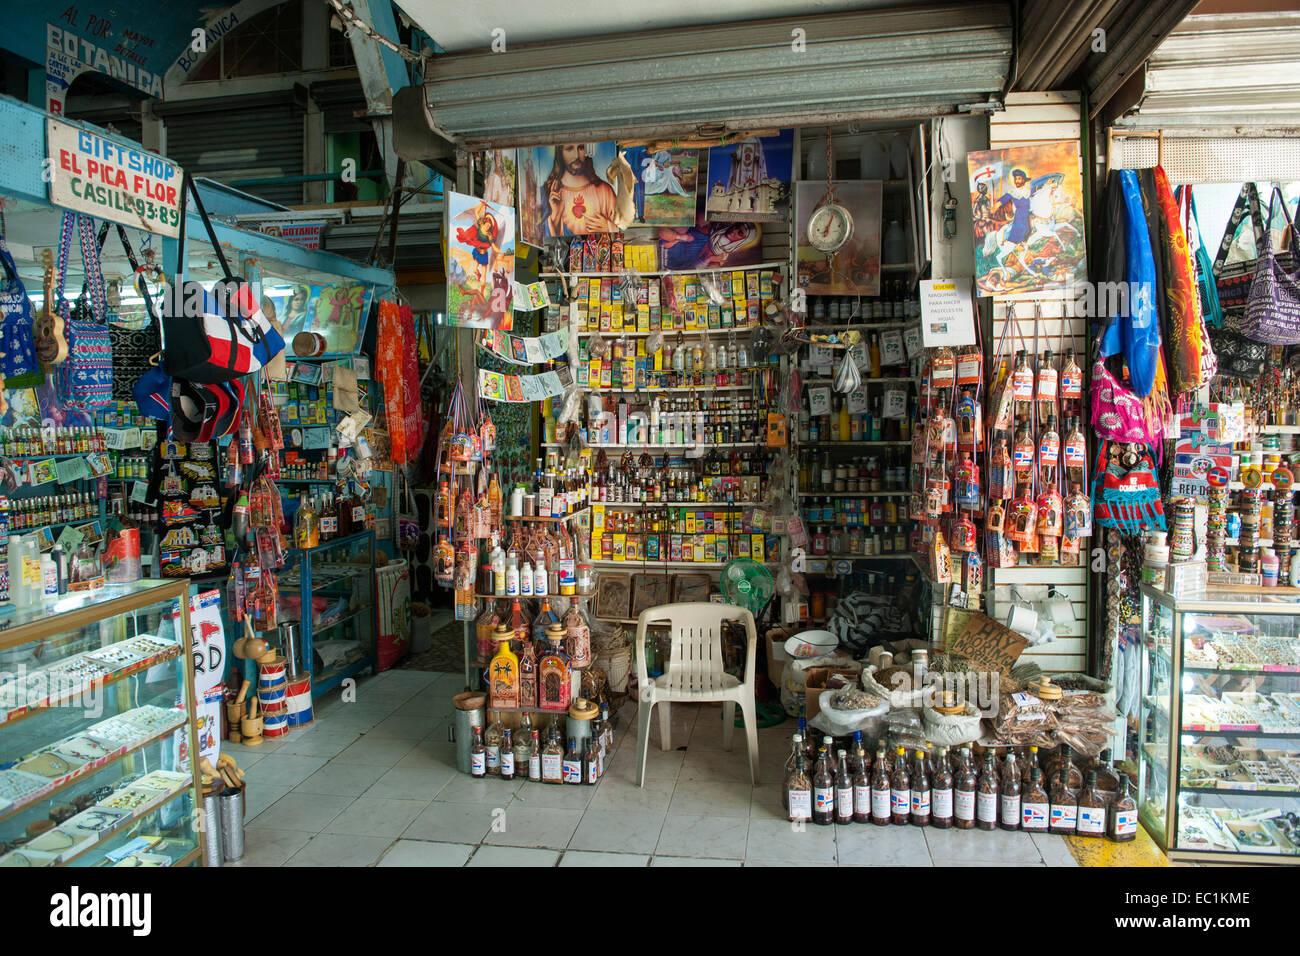 Dominikanische Republik, Santo Domingo, Zona Colonial, Mercado Modelo - Stock Image